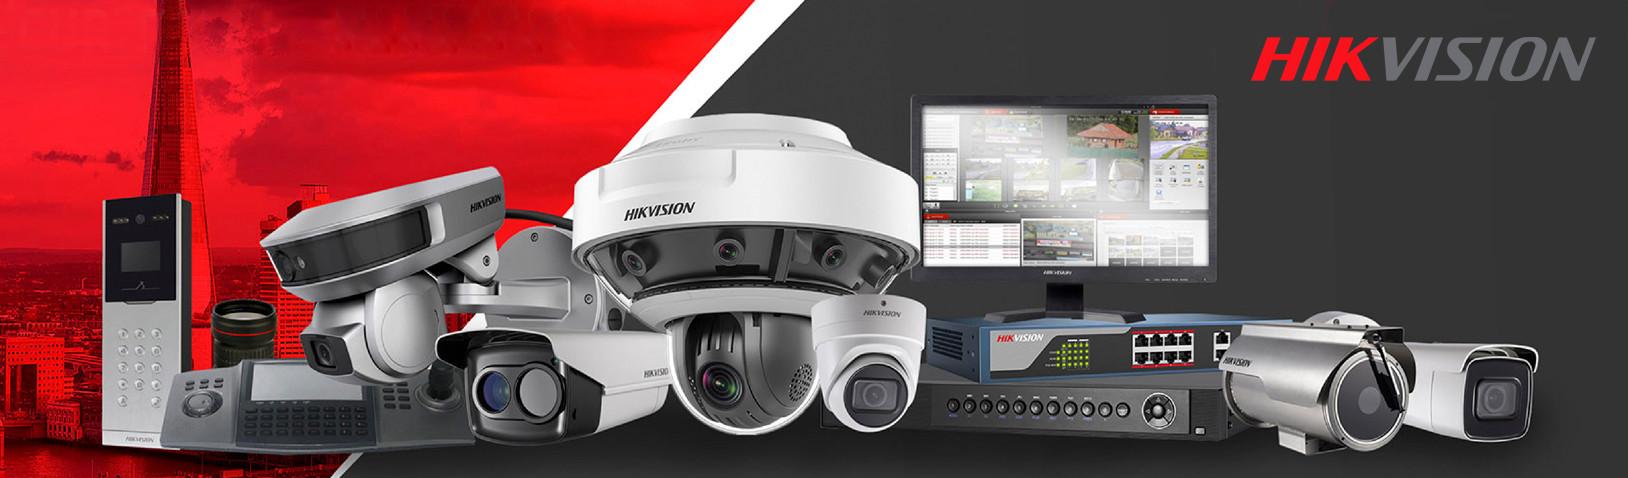 BANNER CCTV-HIKVISION.jpg